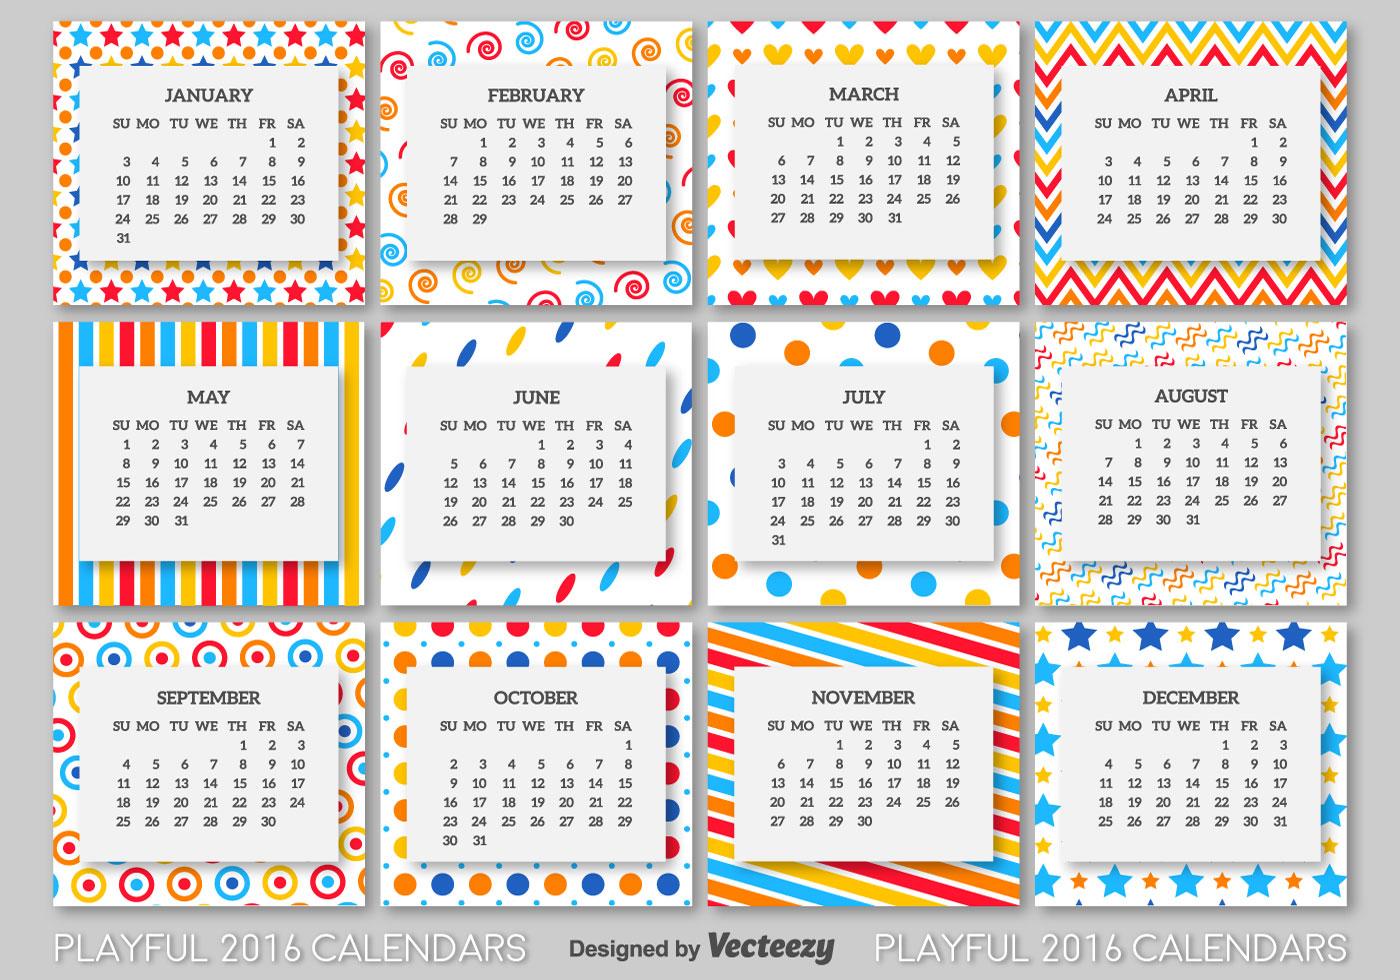 Calendar Template Vector : Calendar template download free vector art stock